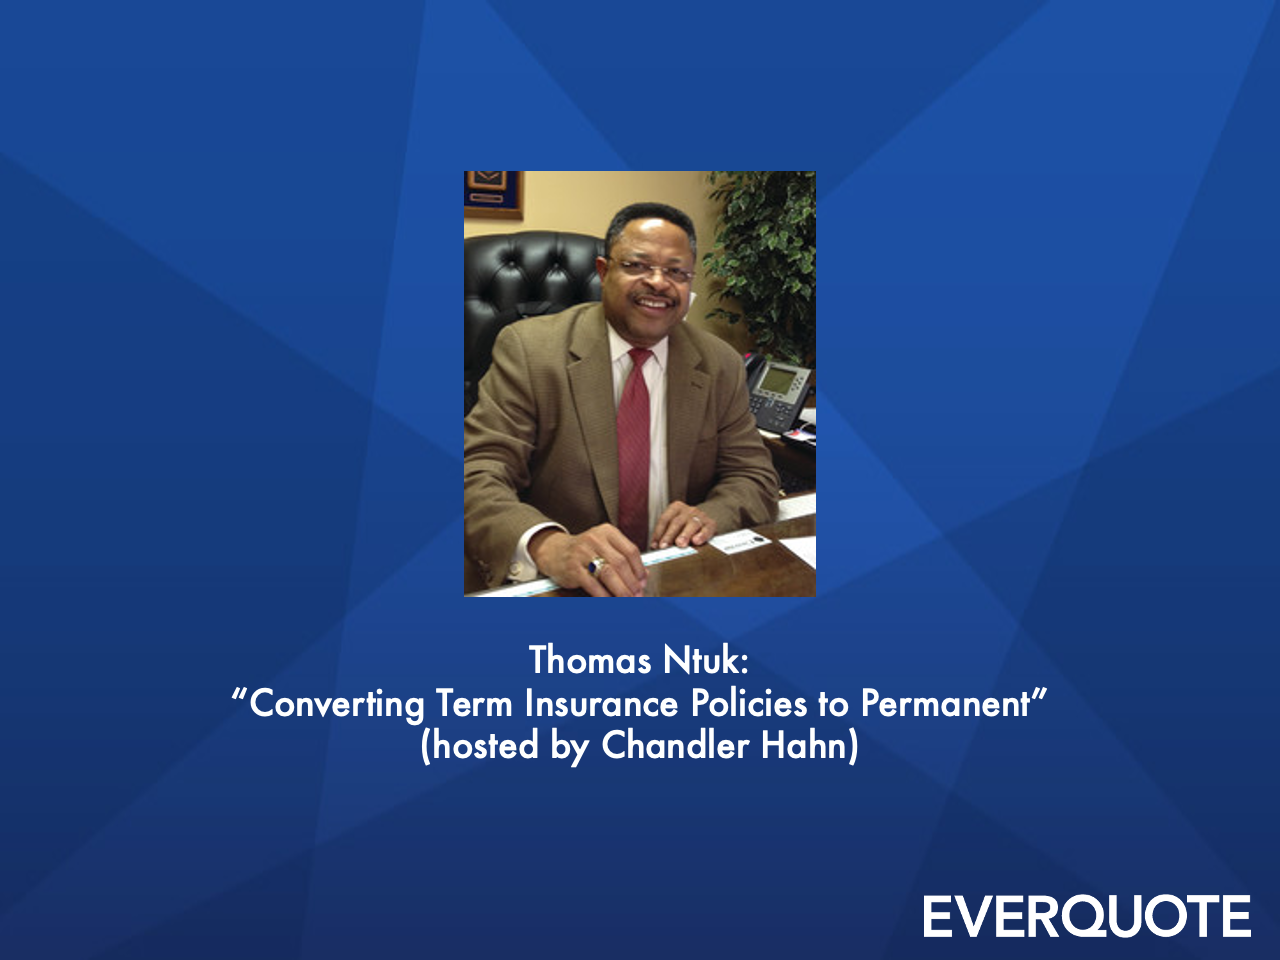 Converting Term Insurance Policies to Permanent with Thomas Ntuk